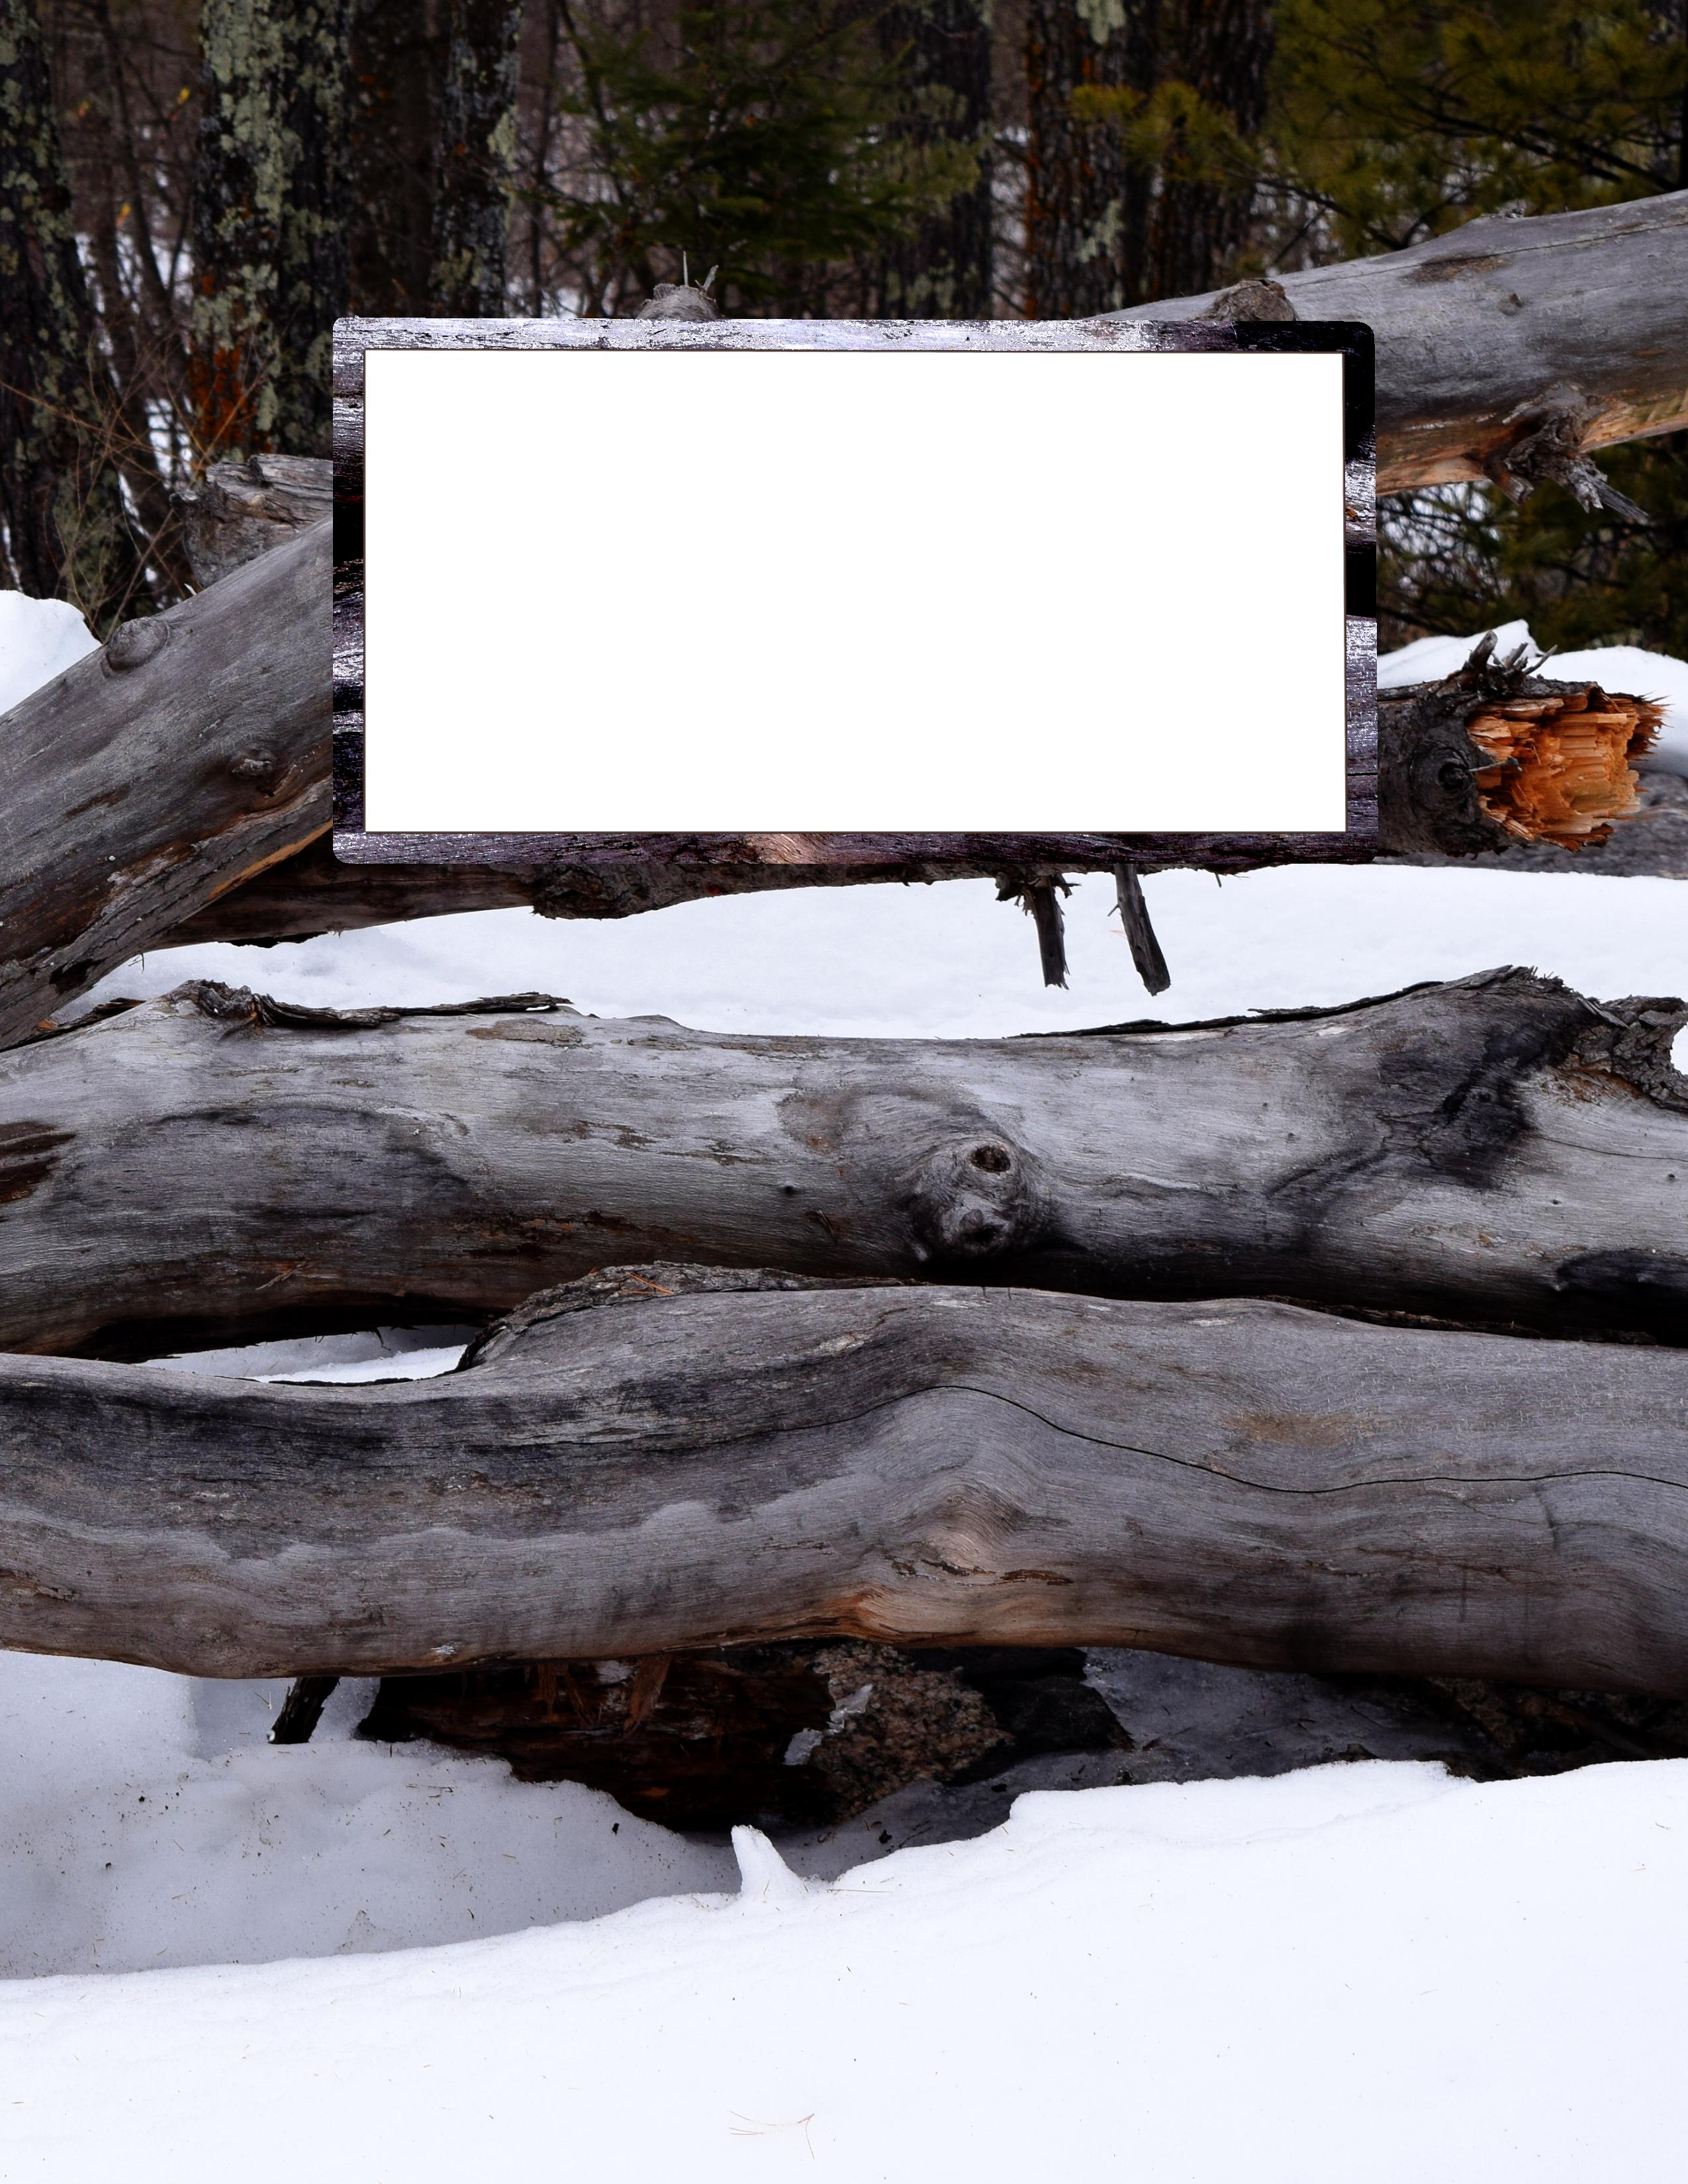 Snow Covered Logs Bullet Journal